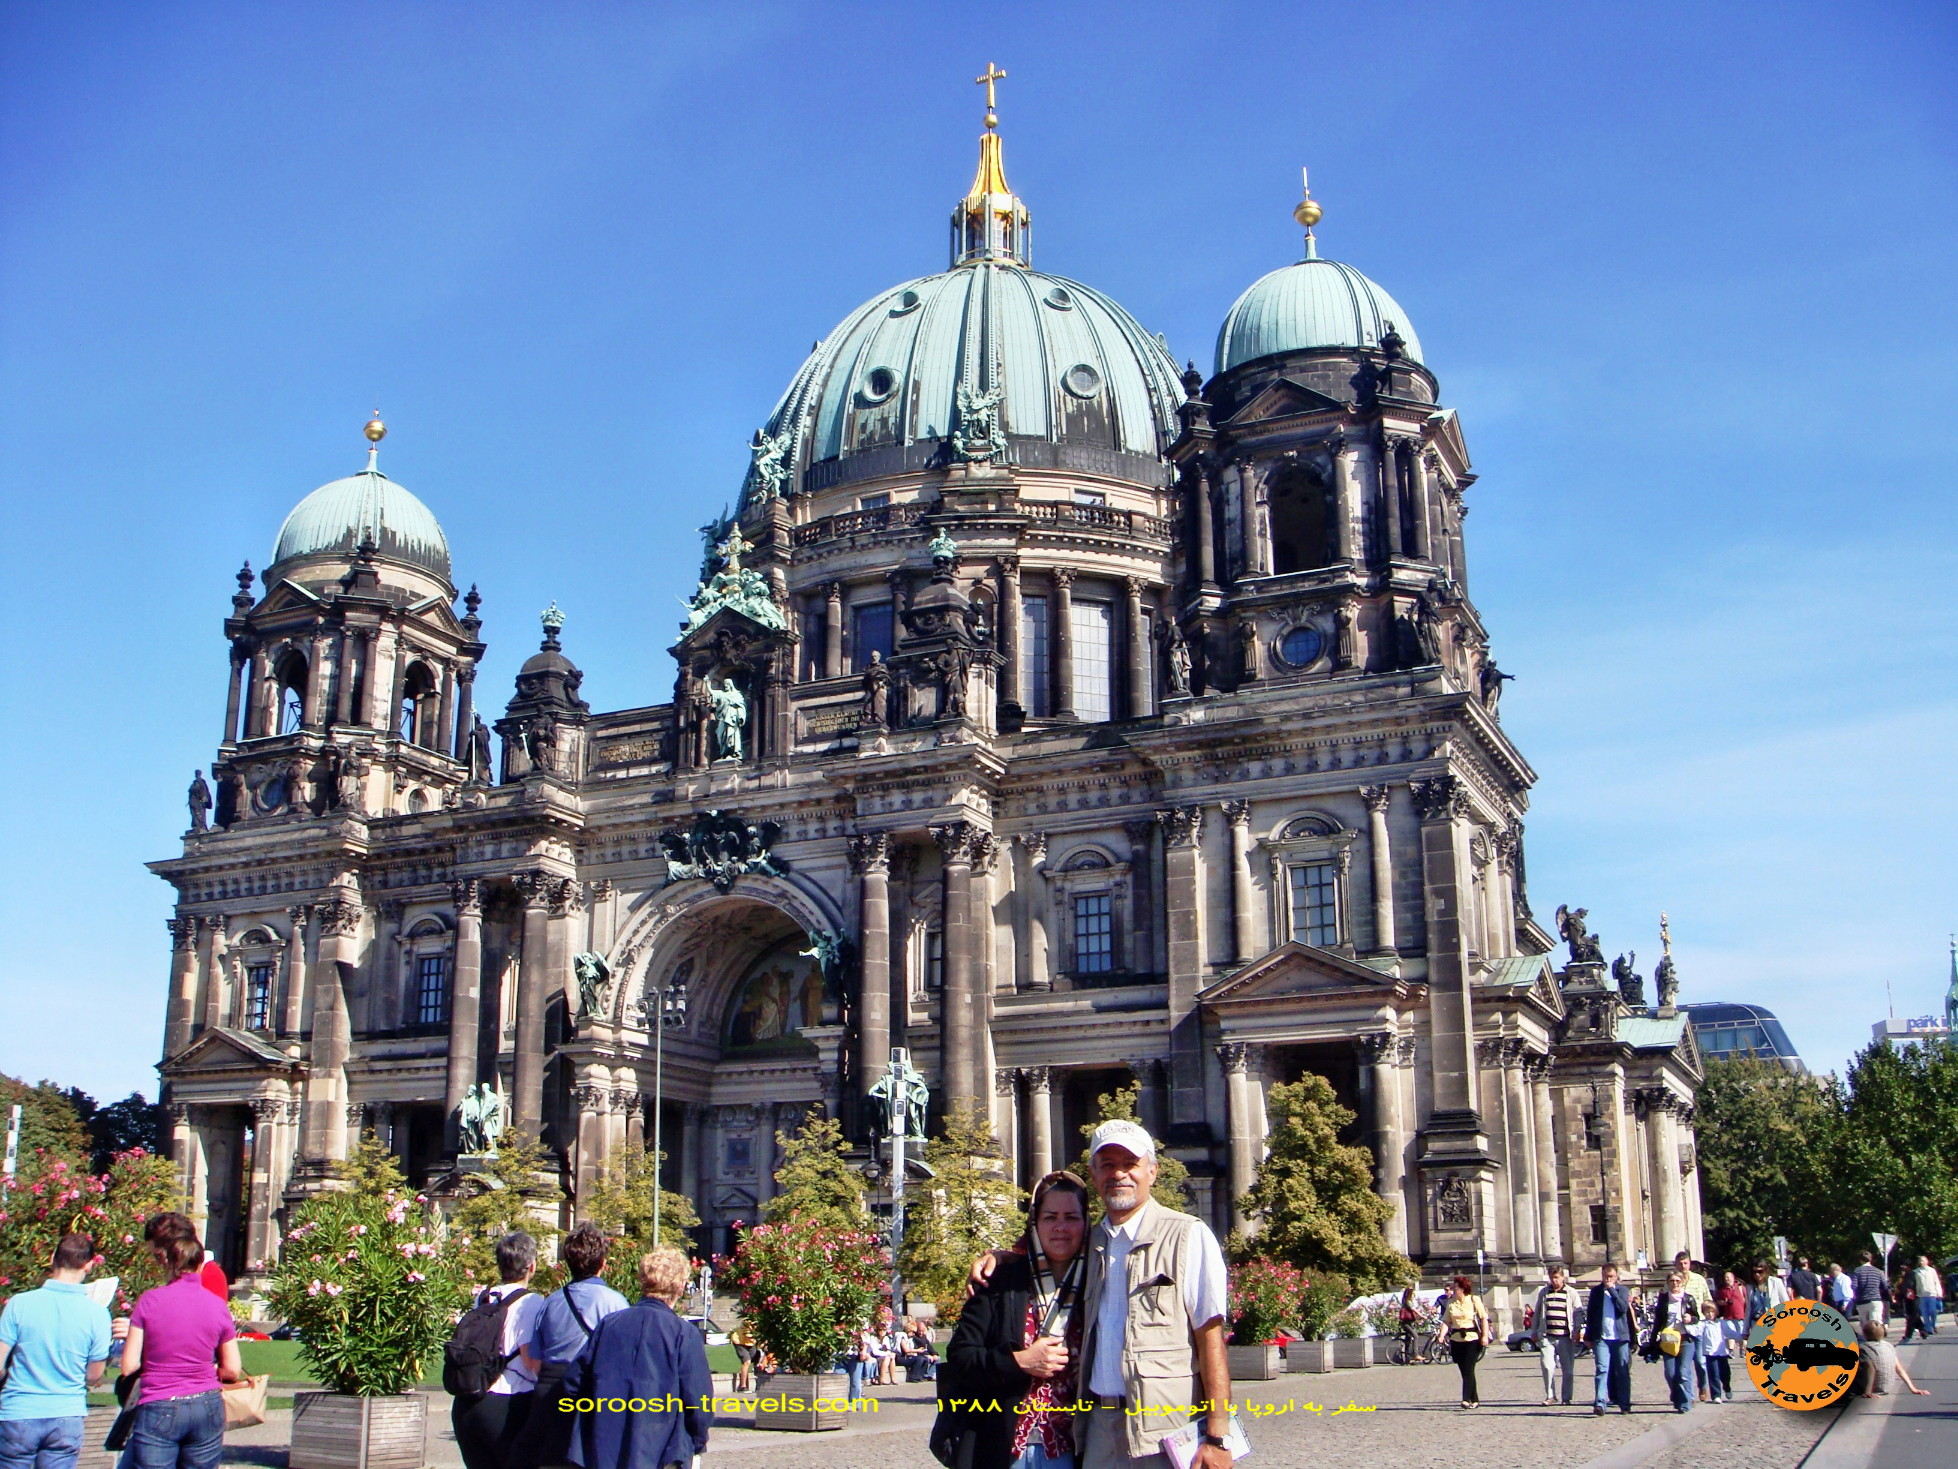 ۲۸ شهریور ۱۳۸۸ – برلین  Berlin